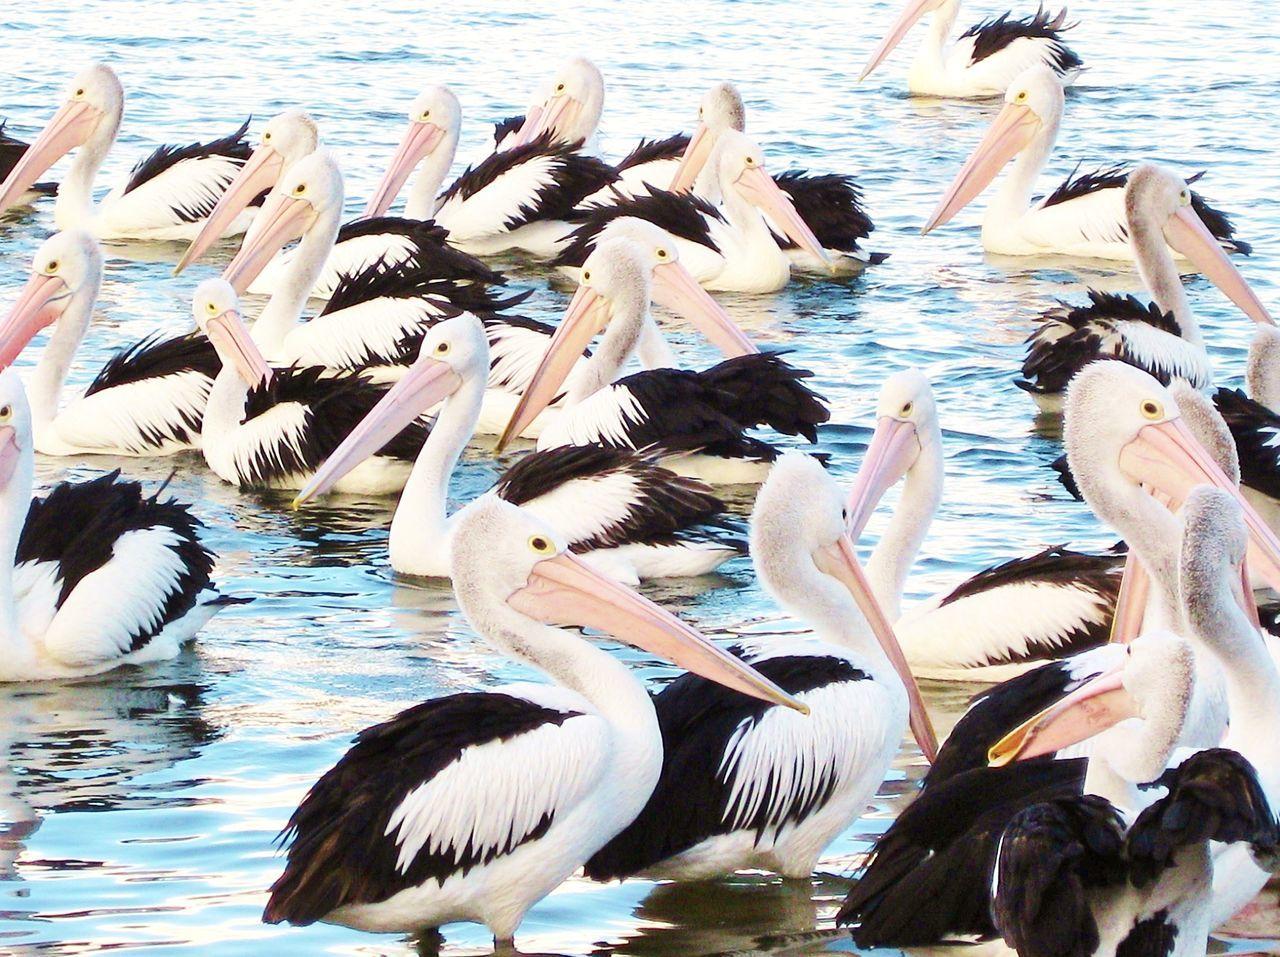 FLOCK OF BIRDS FLYING IN LAKE